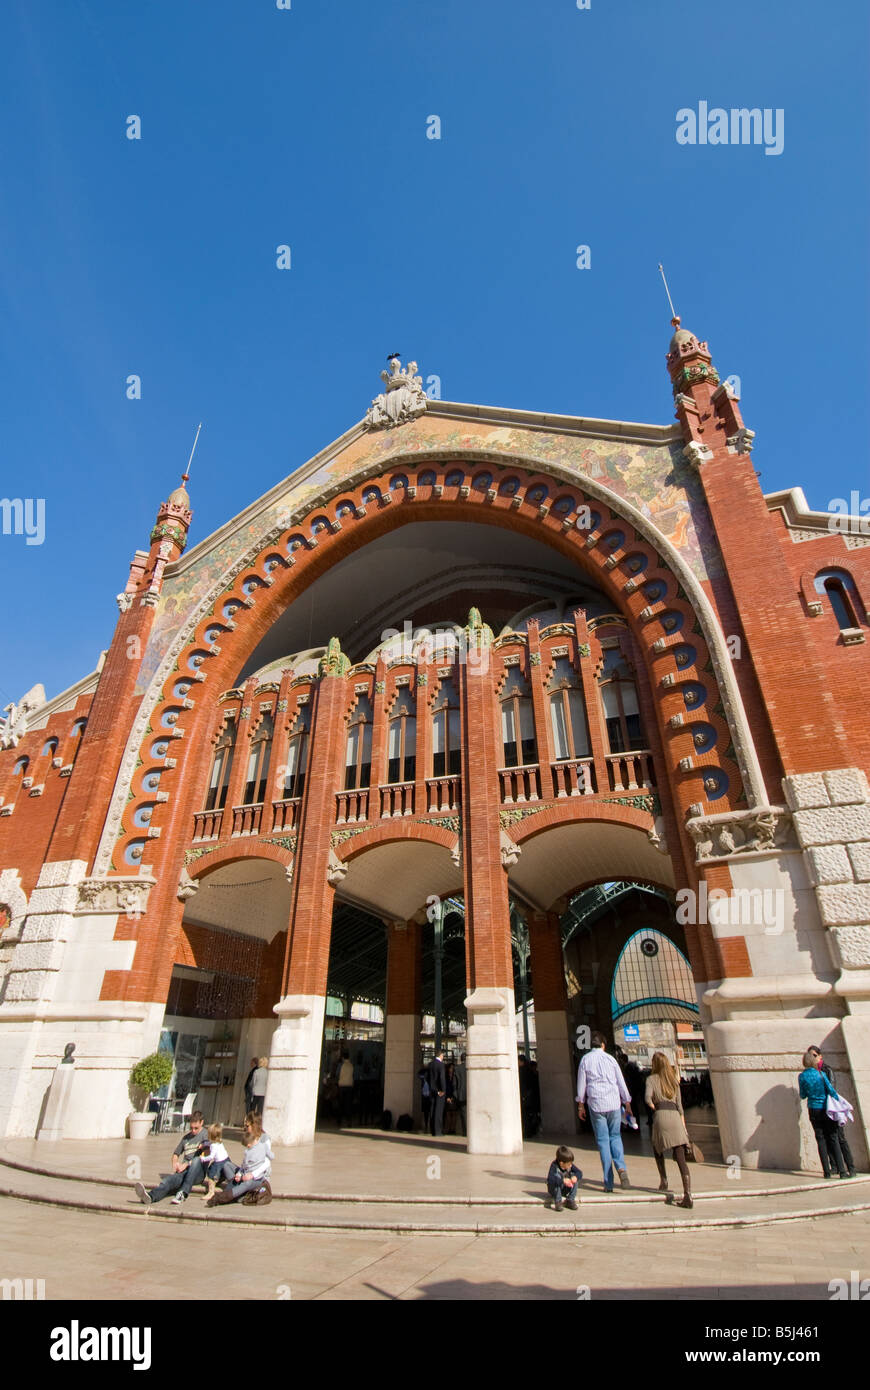 Entrance of former market hall Mercado de Colón in the city of Valencia Spain - Stock Image